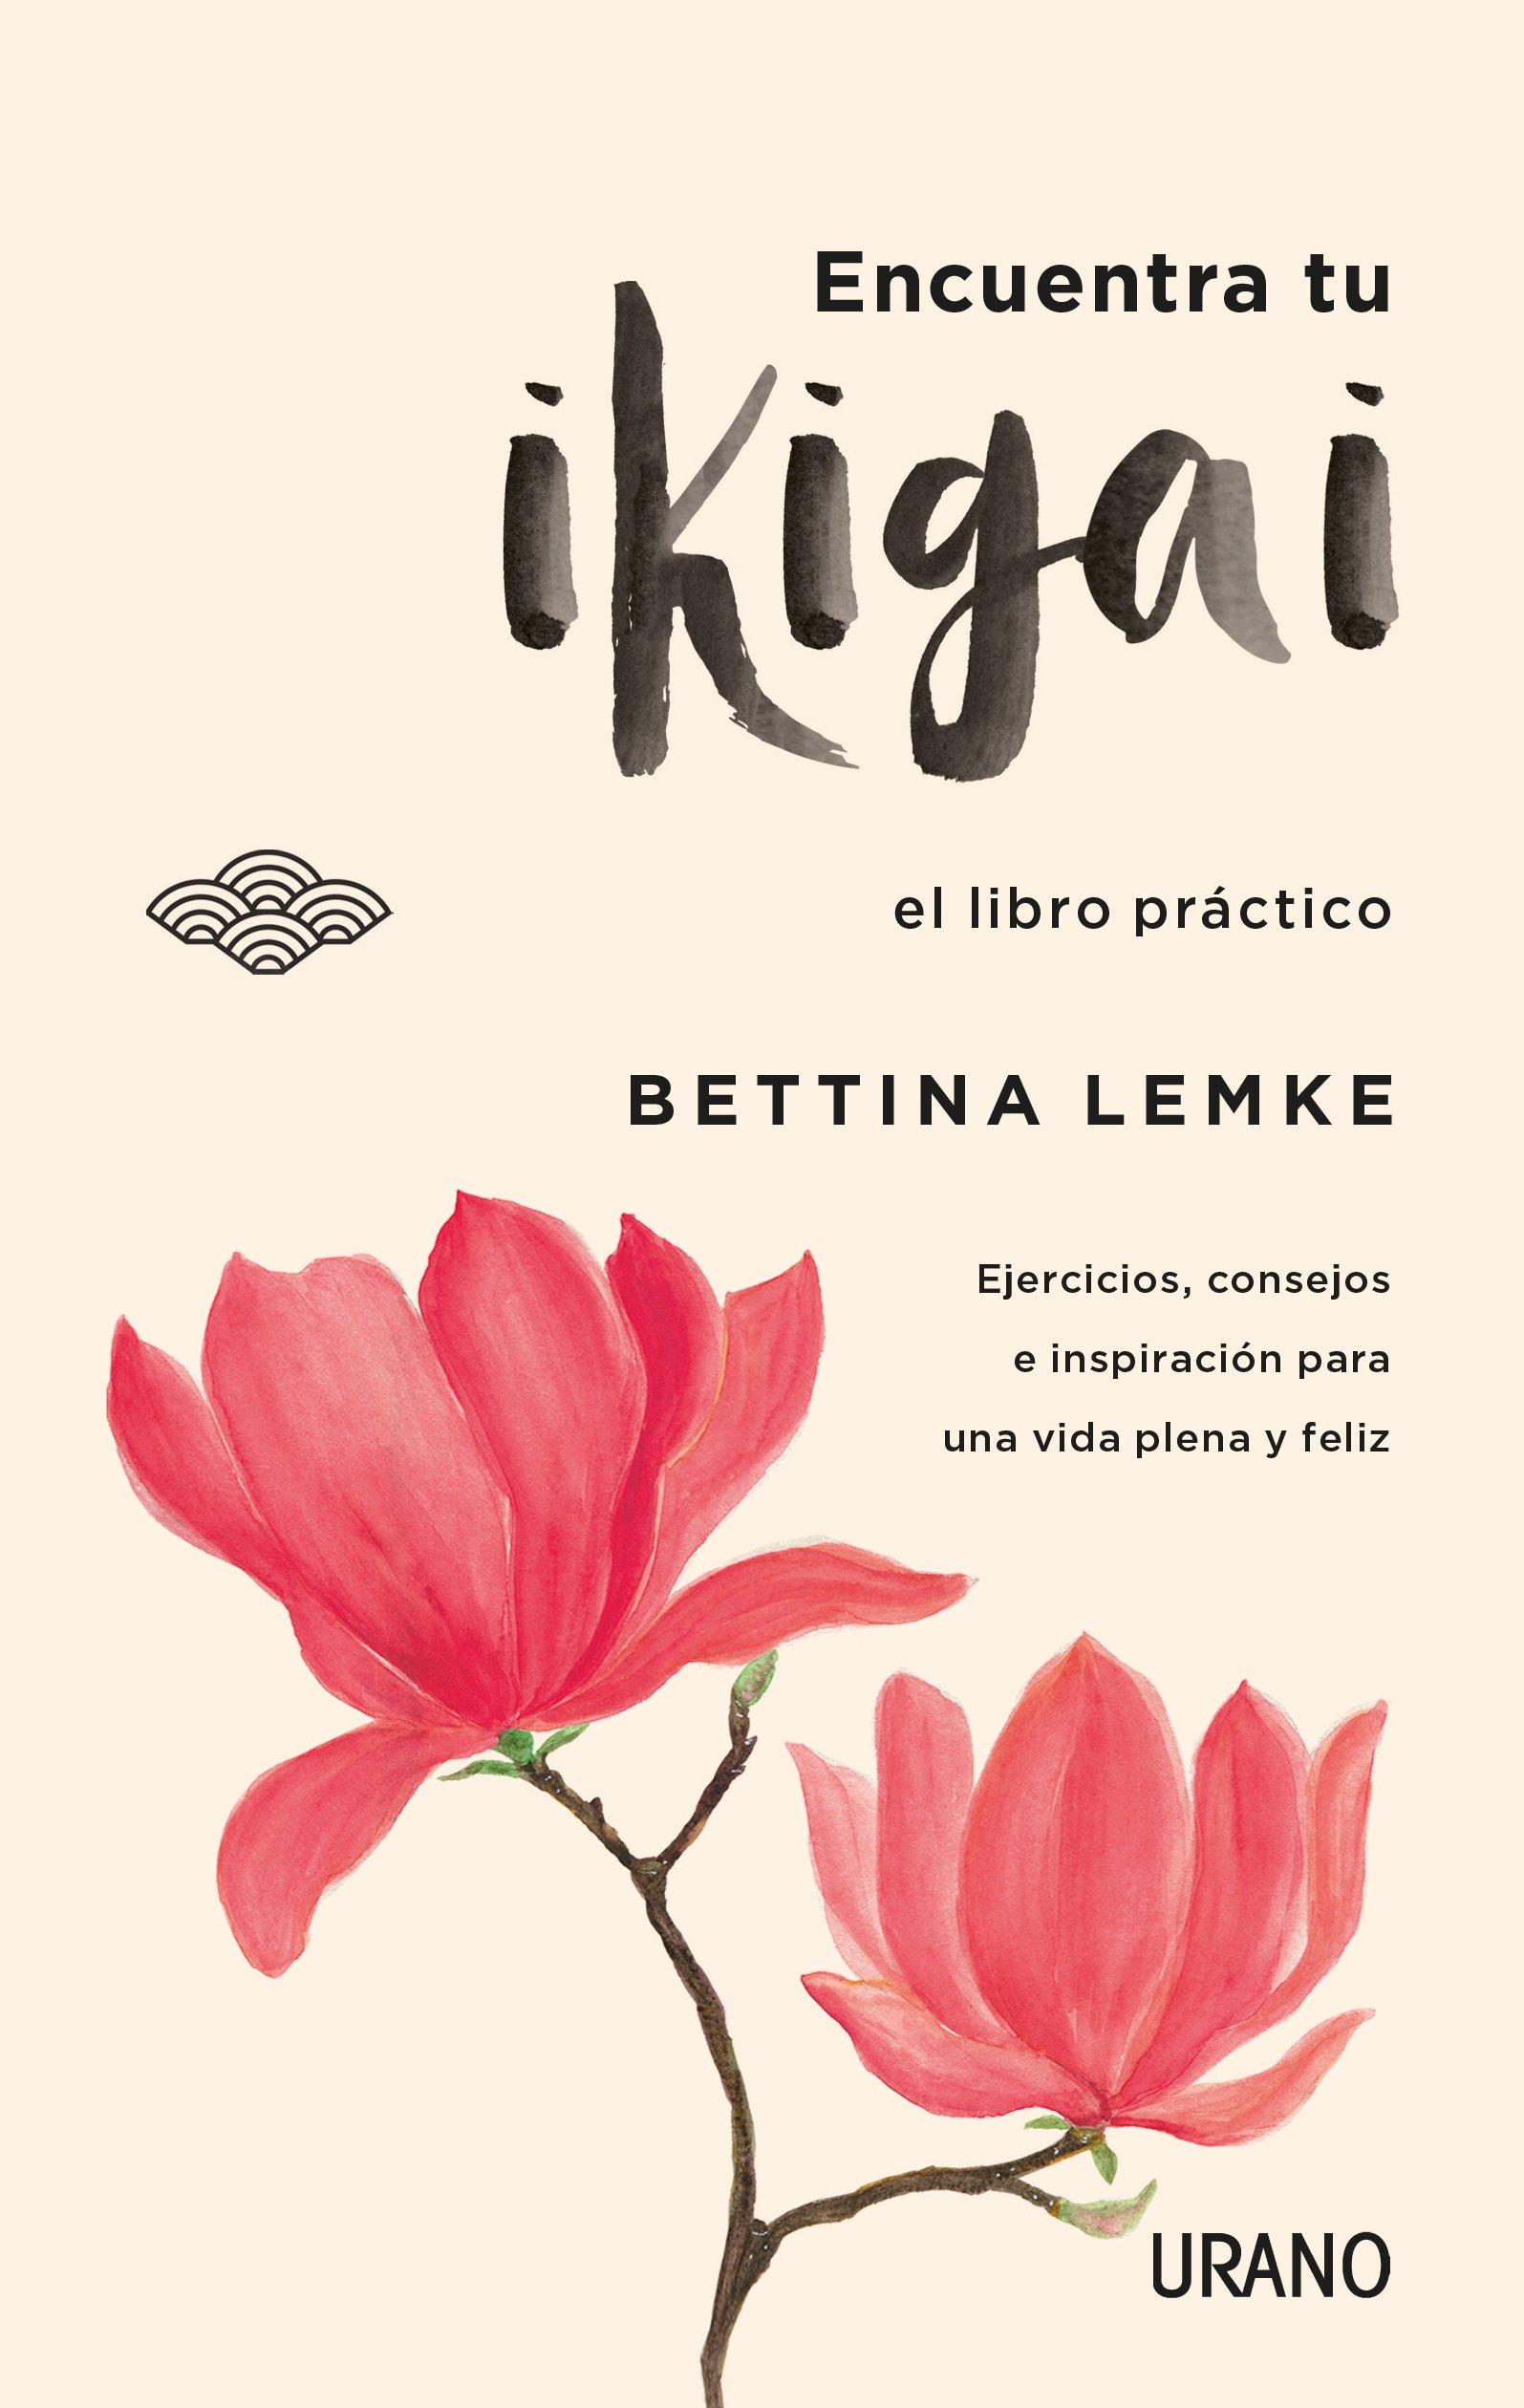 Encuentra tu ikigai (Crecimiento personal): Amazon.es: BETTINA LEMKE,  Isabel Romero Reche: Libros